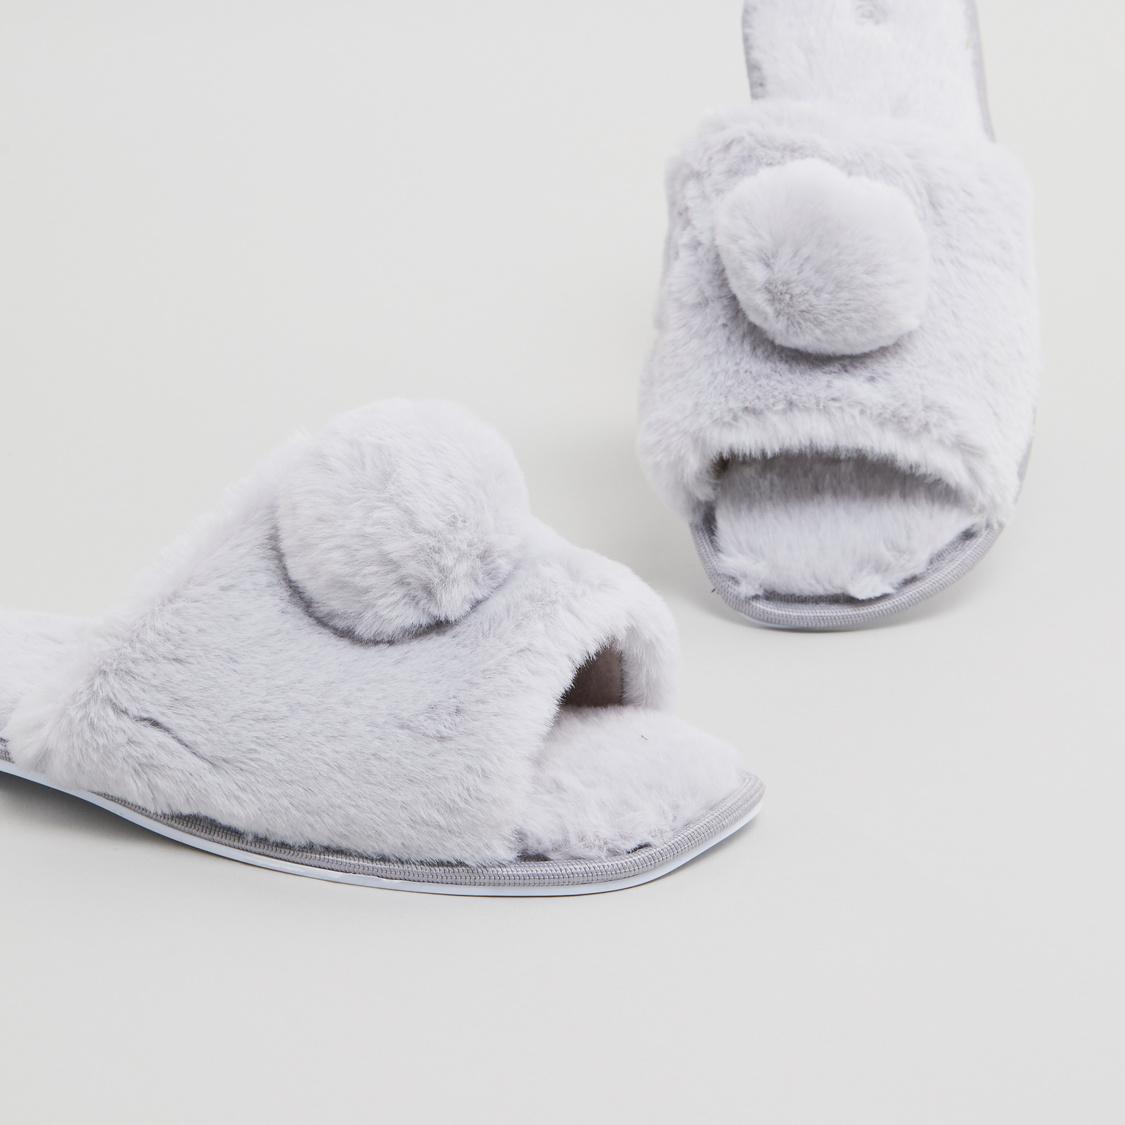 Plush Bedroom Slippers with Pom-Pom Detail